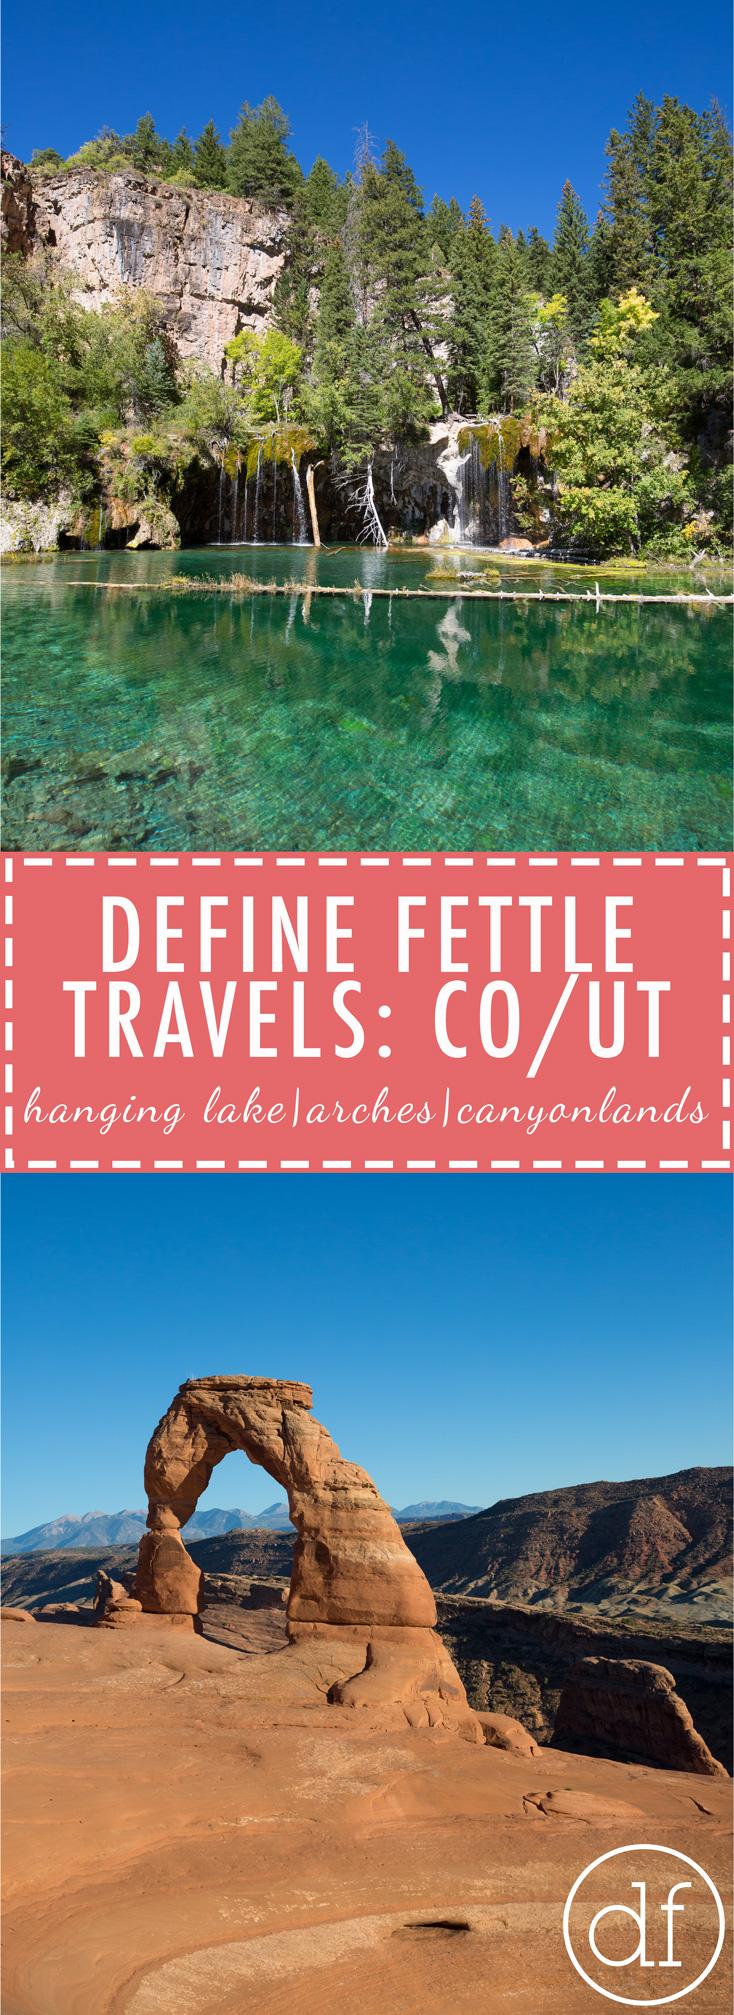 Hanging Lake, Colorado, Travel Blog, Arches National Park, Canyonlands National Park, Blogger, Best Spots At Arches National Park, Hiking Arches, Canyonlands, Outdoors, Define Fettle,